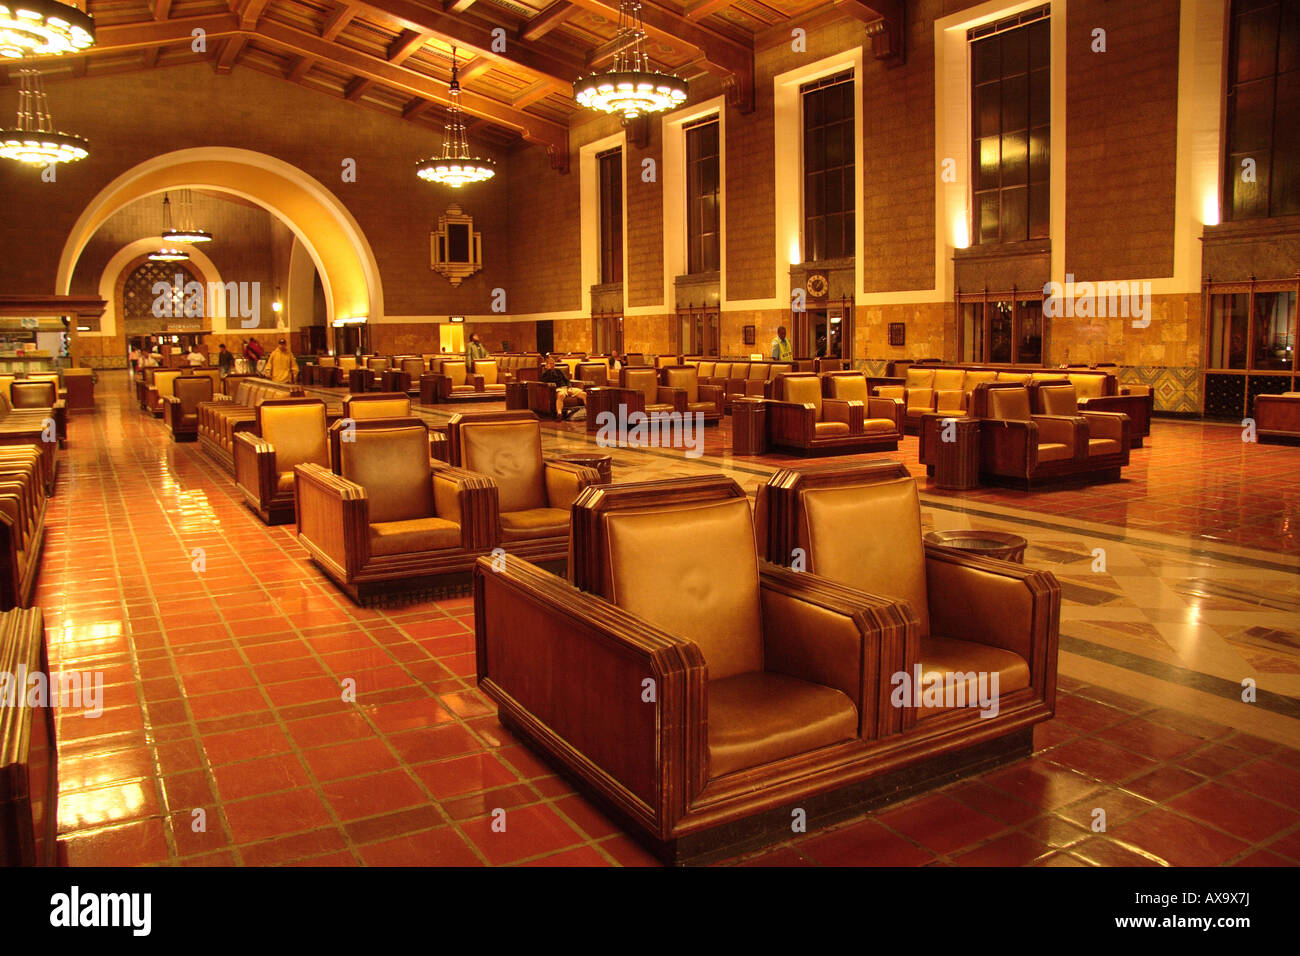 Interior Los Angeles Union Station Lobby 1940's decor Foto Stock